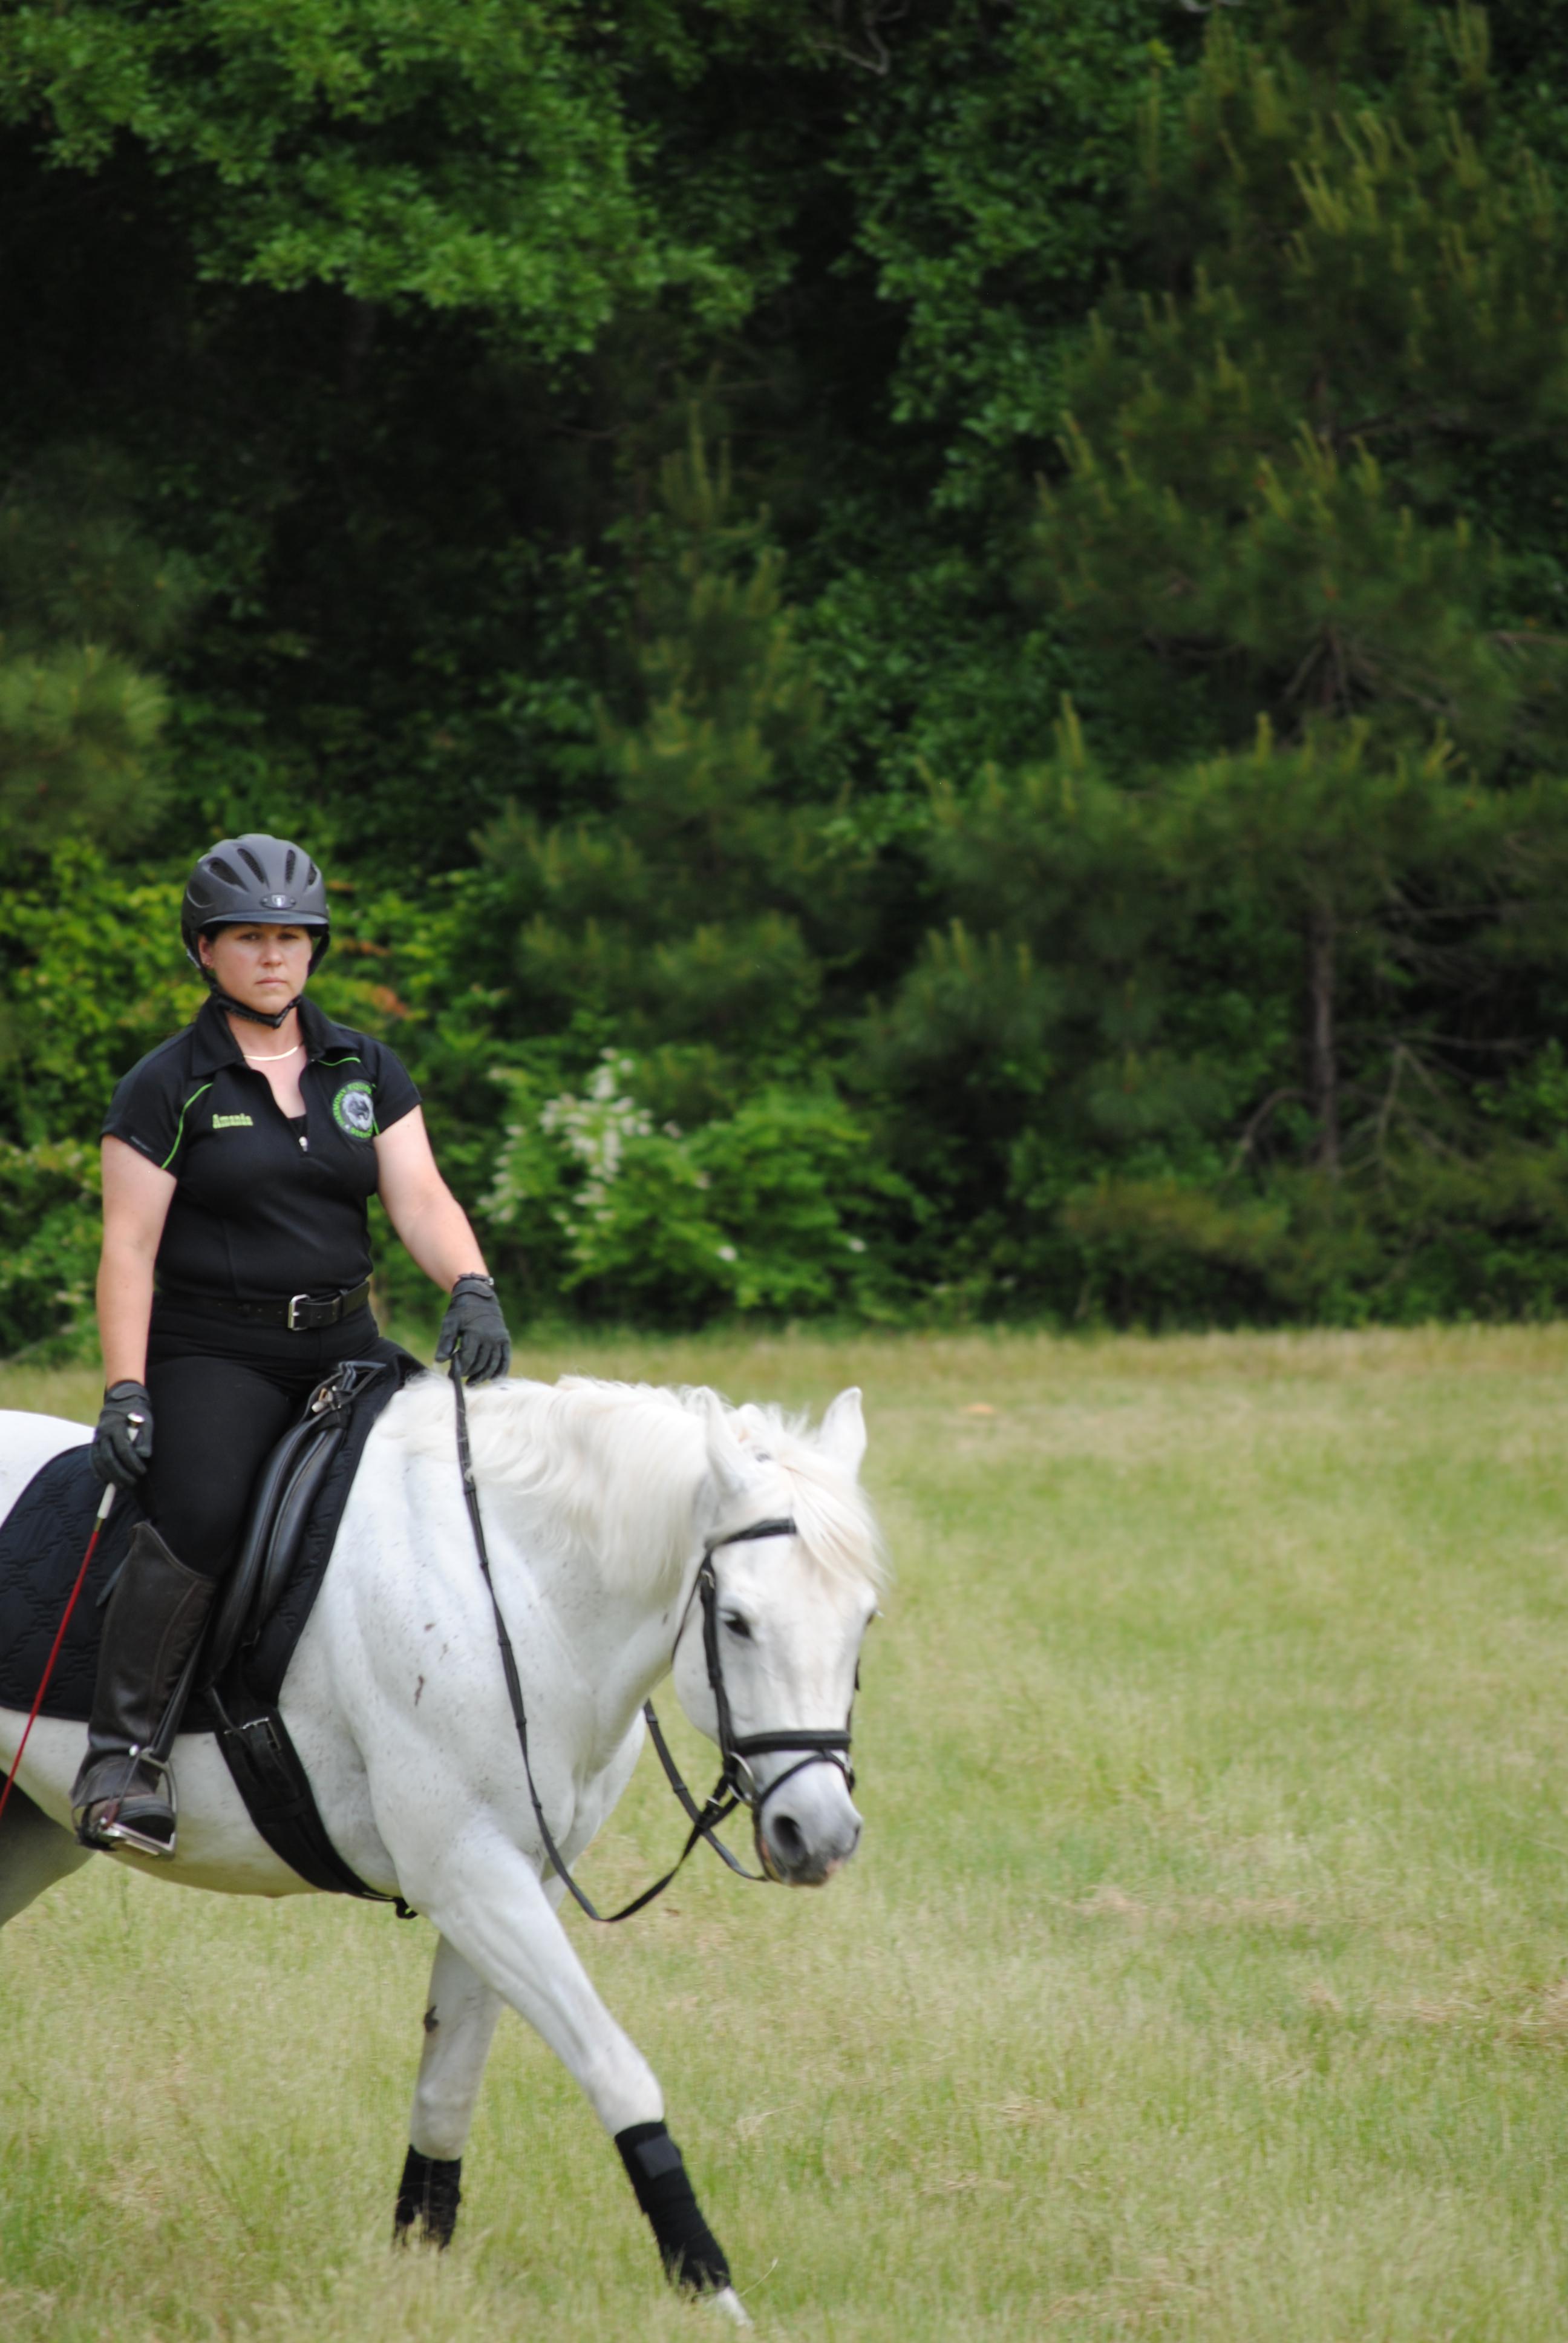 Amanda_riding_Dazzle_237.jpg